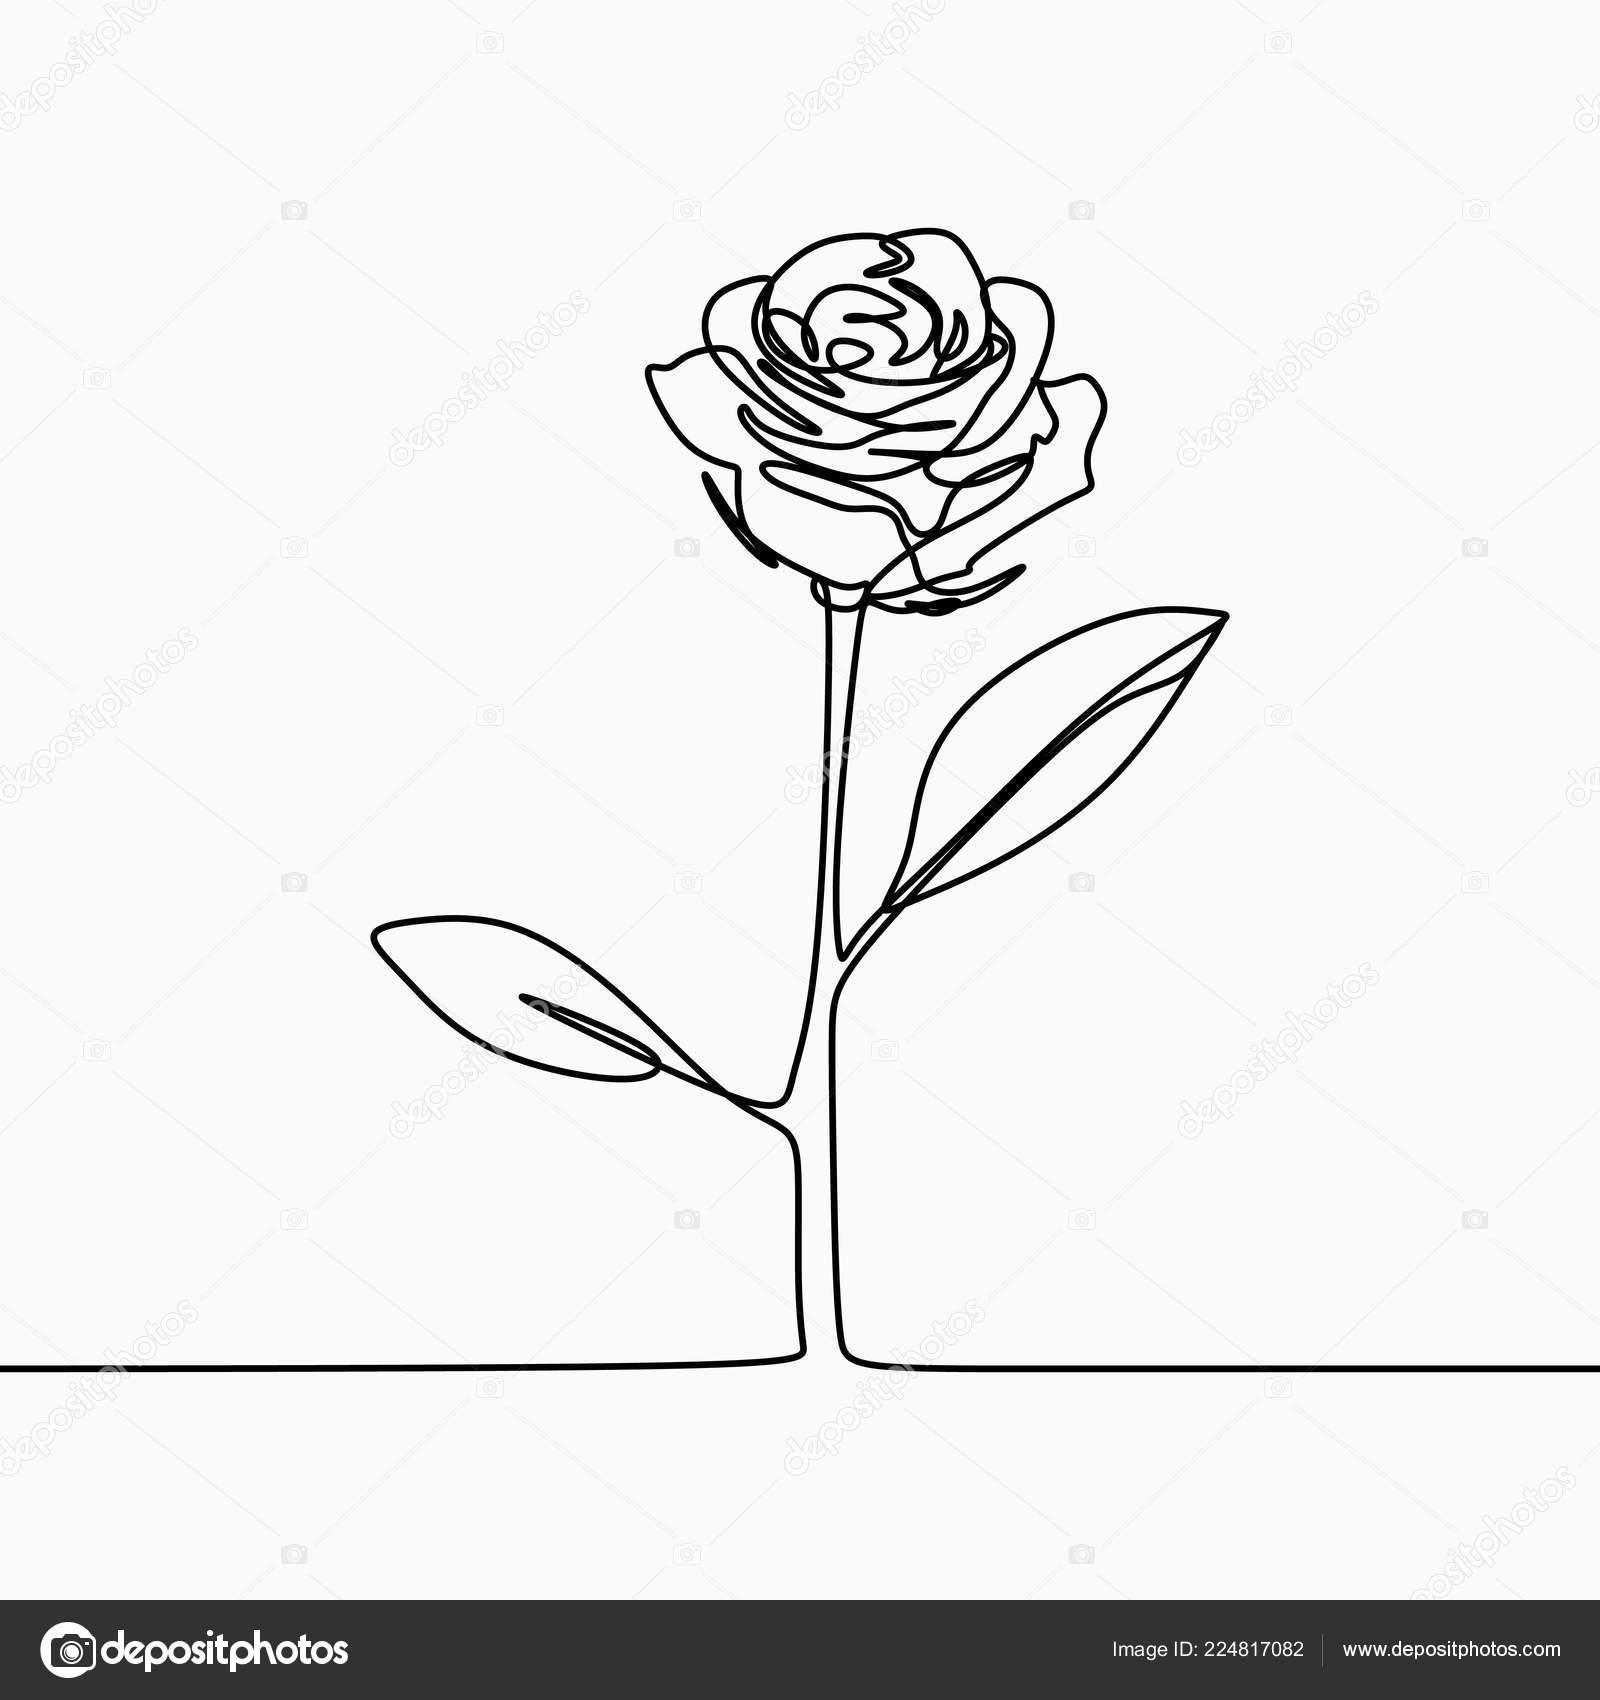 One Line Drawing Rose Flower Minimal Modern Simple Design